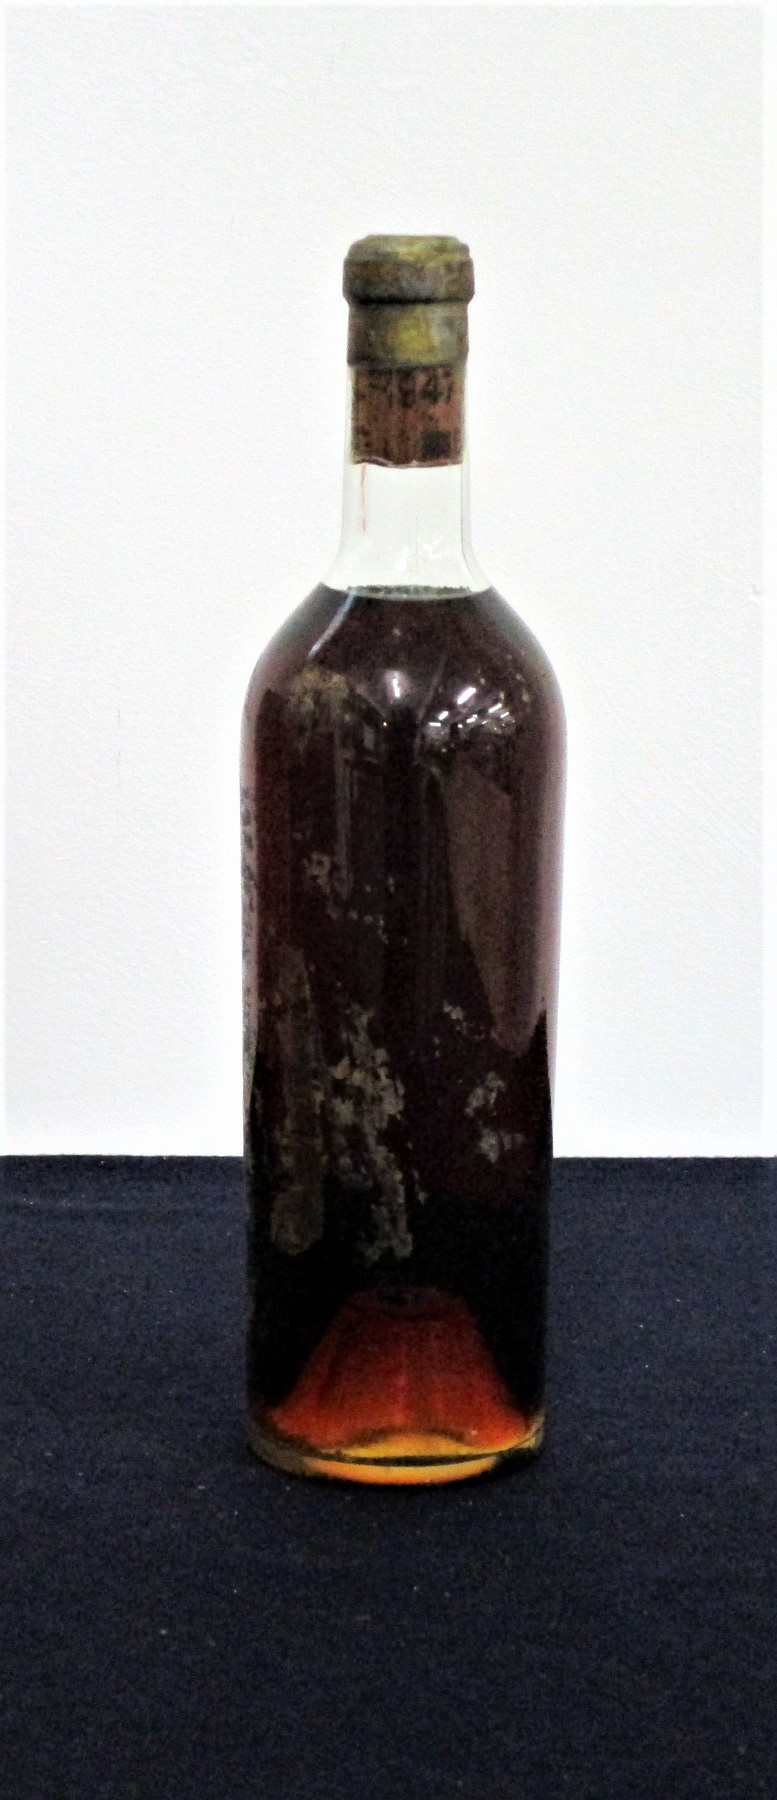 1 bt Ch. d'Yquem 1947 Sauternes 1er Grand Cru Classé, us. embossed capsule, missing label, ID from